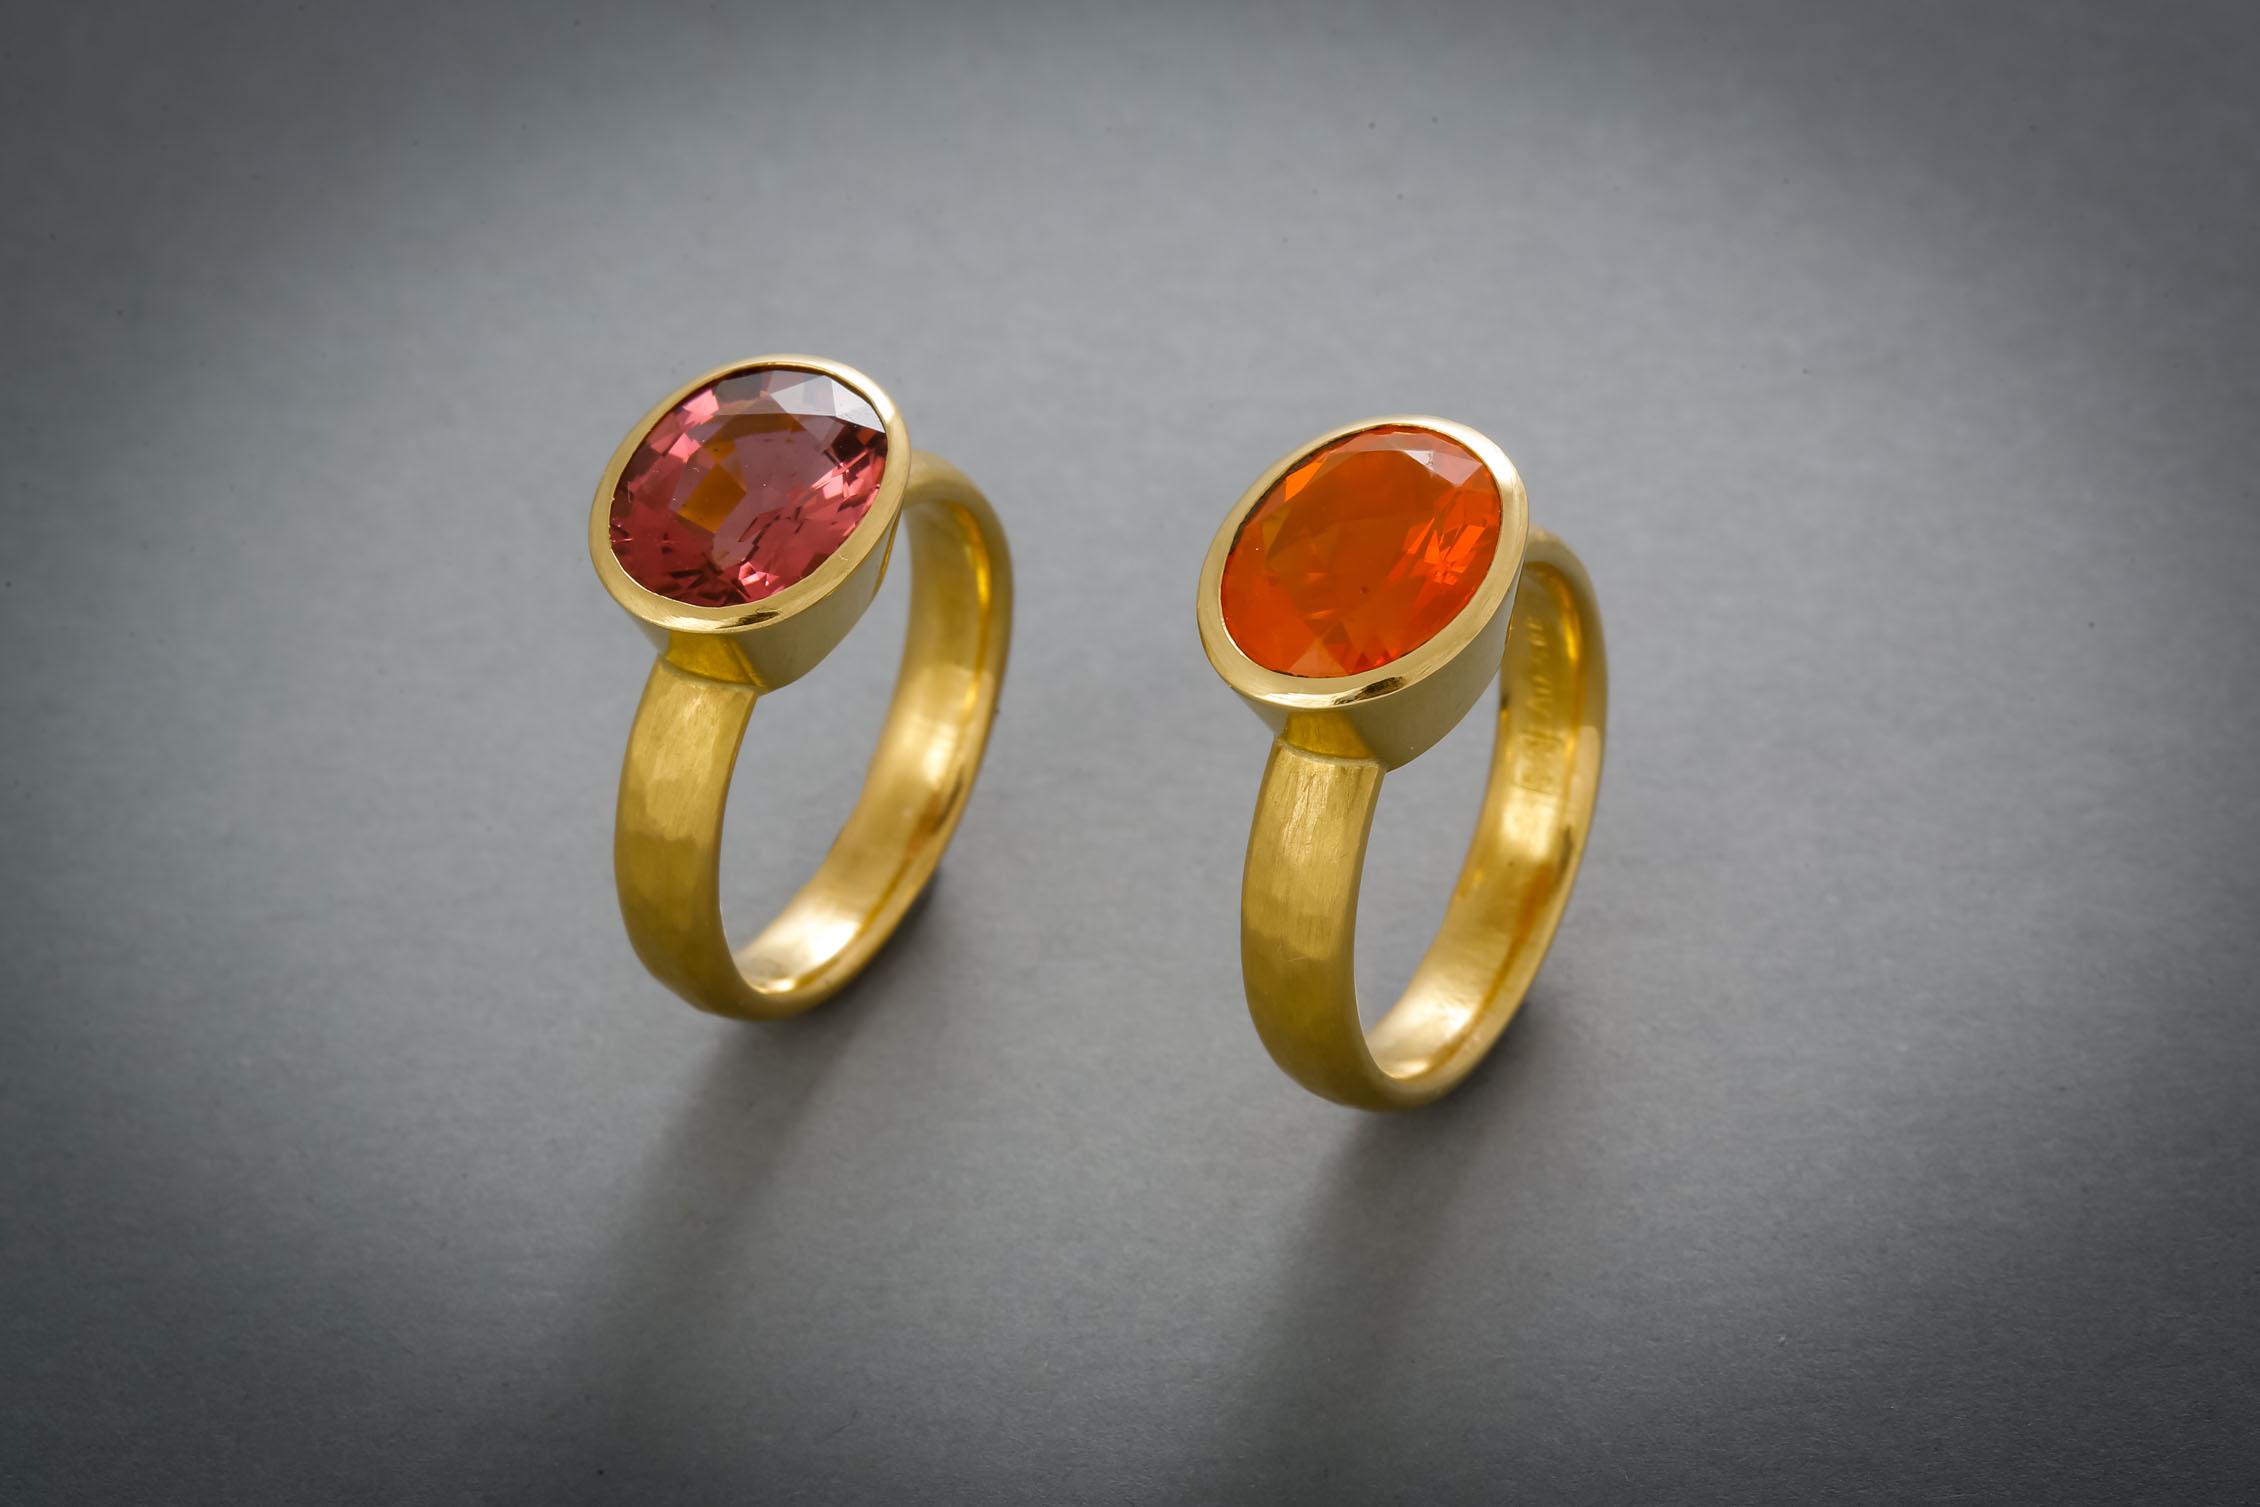 094 Goldring, Turmalin, rosé € 1112,- Goldring, Feueropal € 1214,-